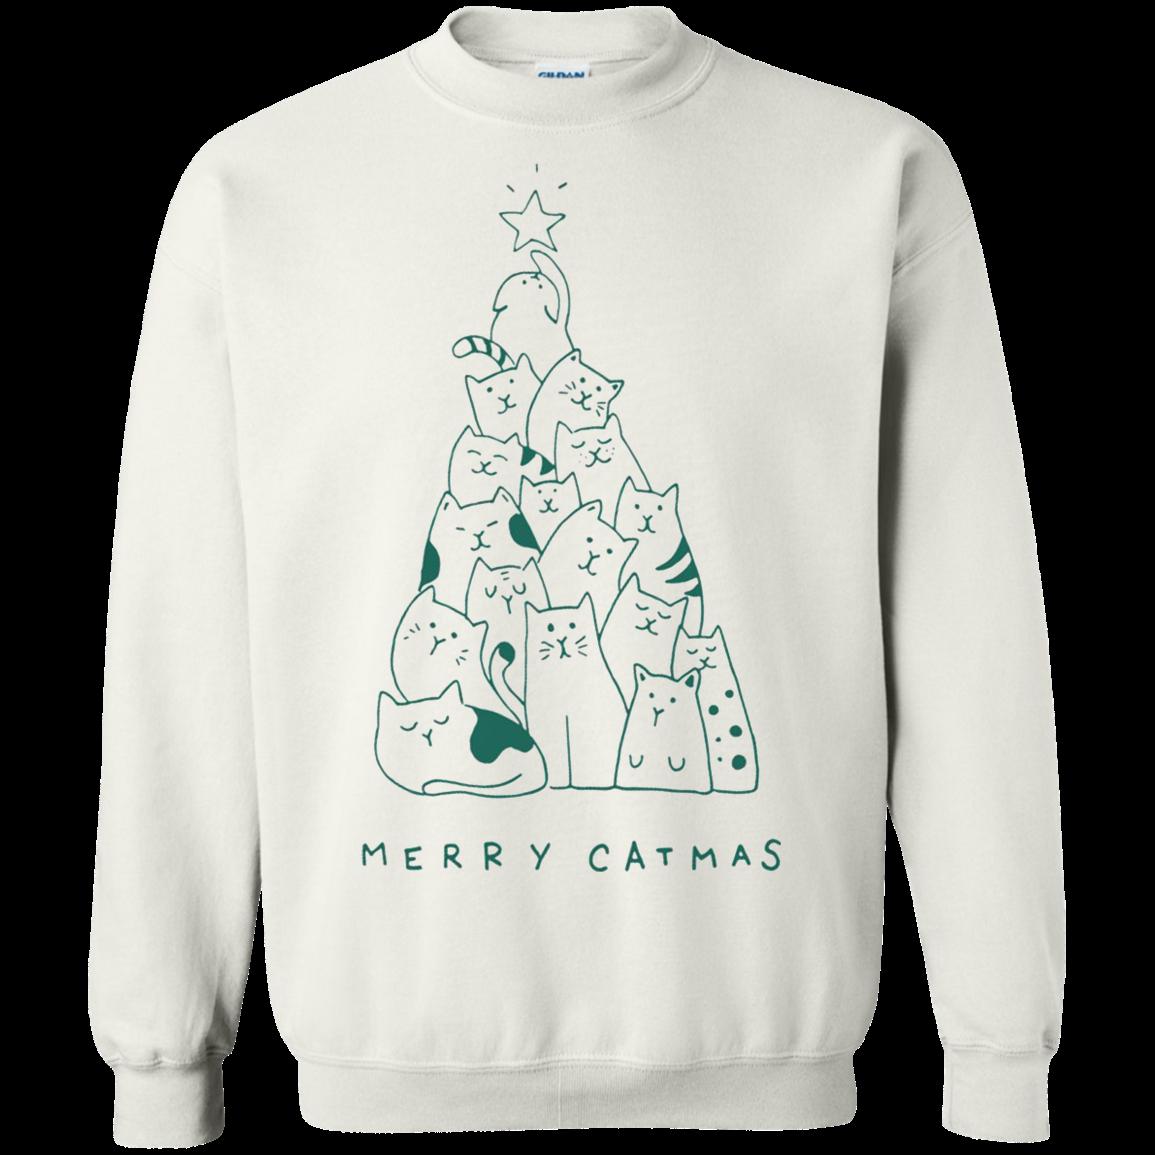 54ea25c46637a9 Merry Catmas Sweater - White - Shipping Worldwide - NINONINE